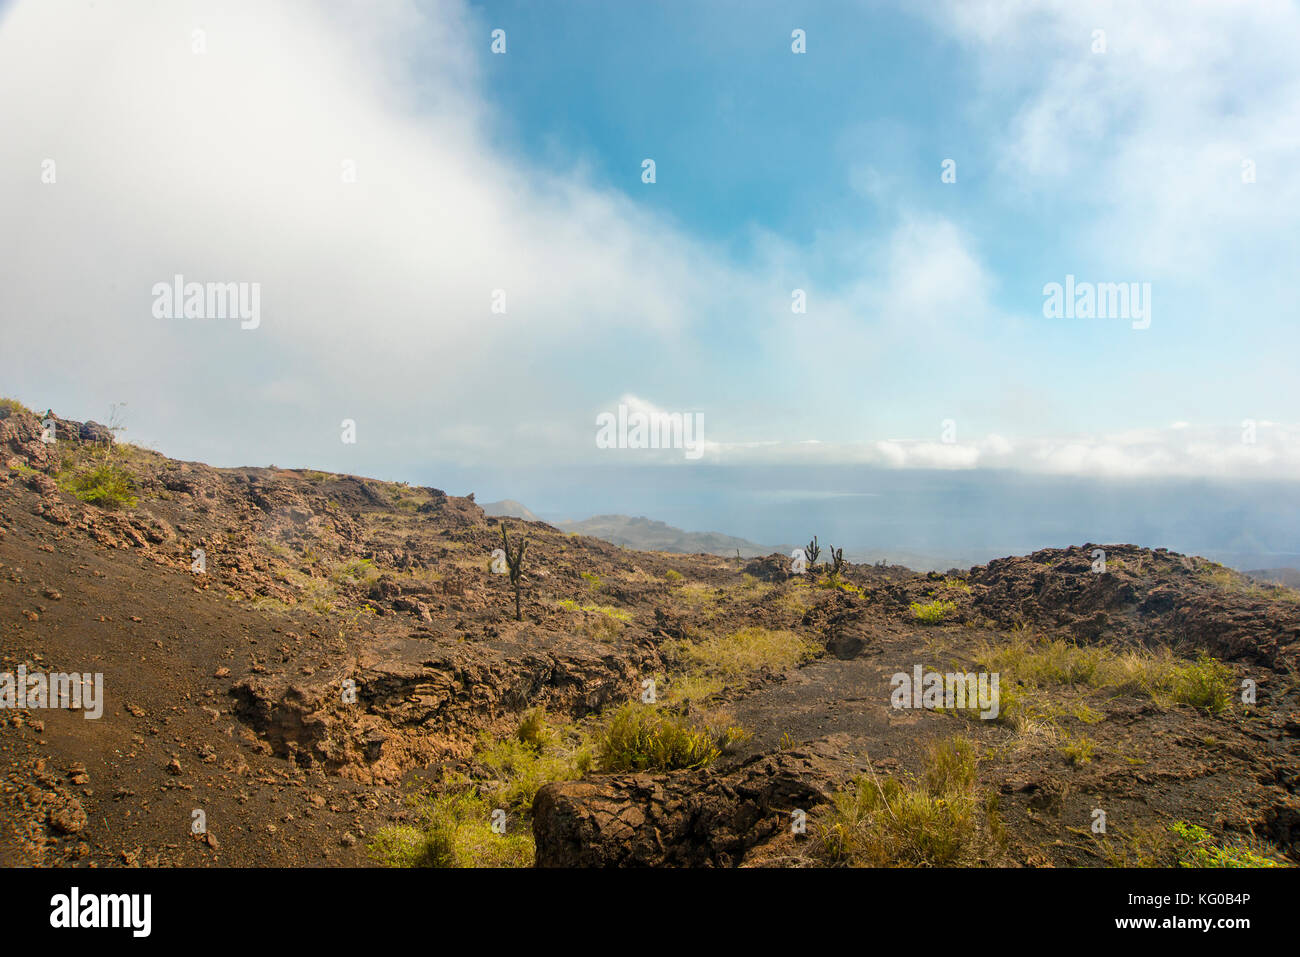 south america ecuador Galapagos isla isabela travel sierra negra - Stock Image